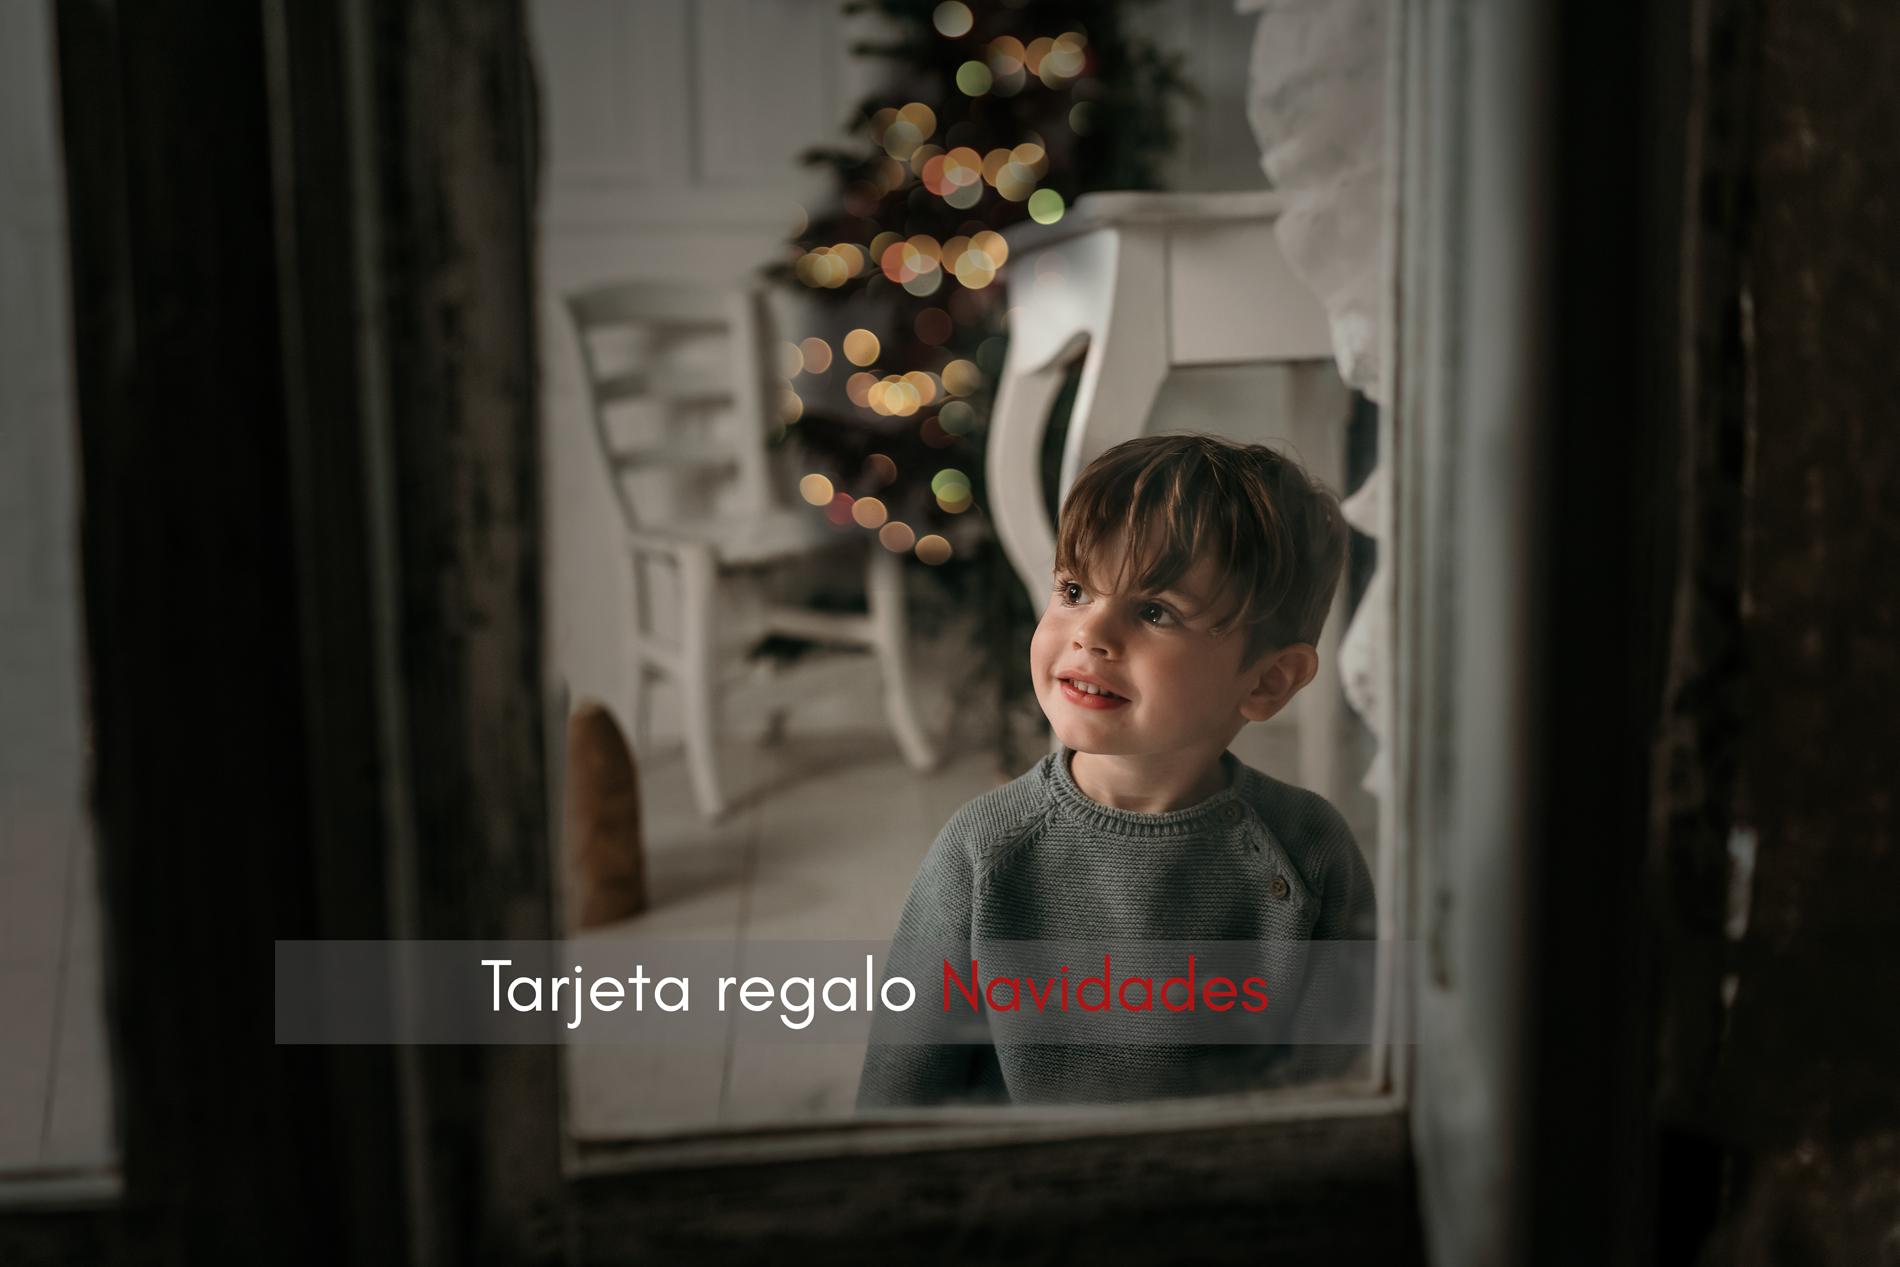 tarjeta regalo navidades